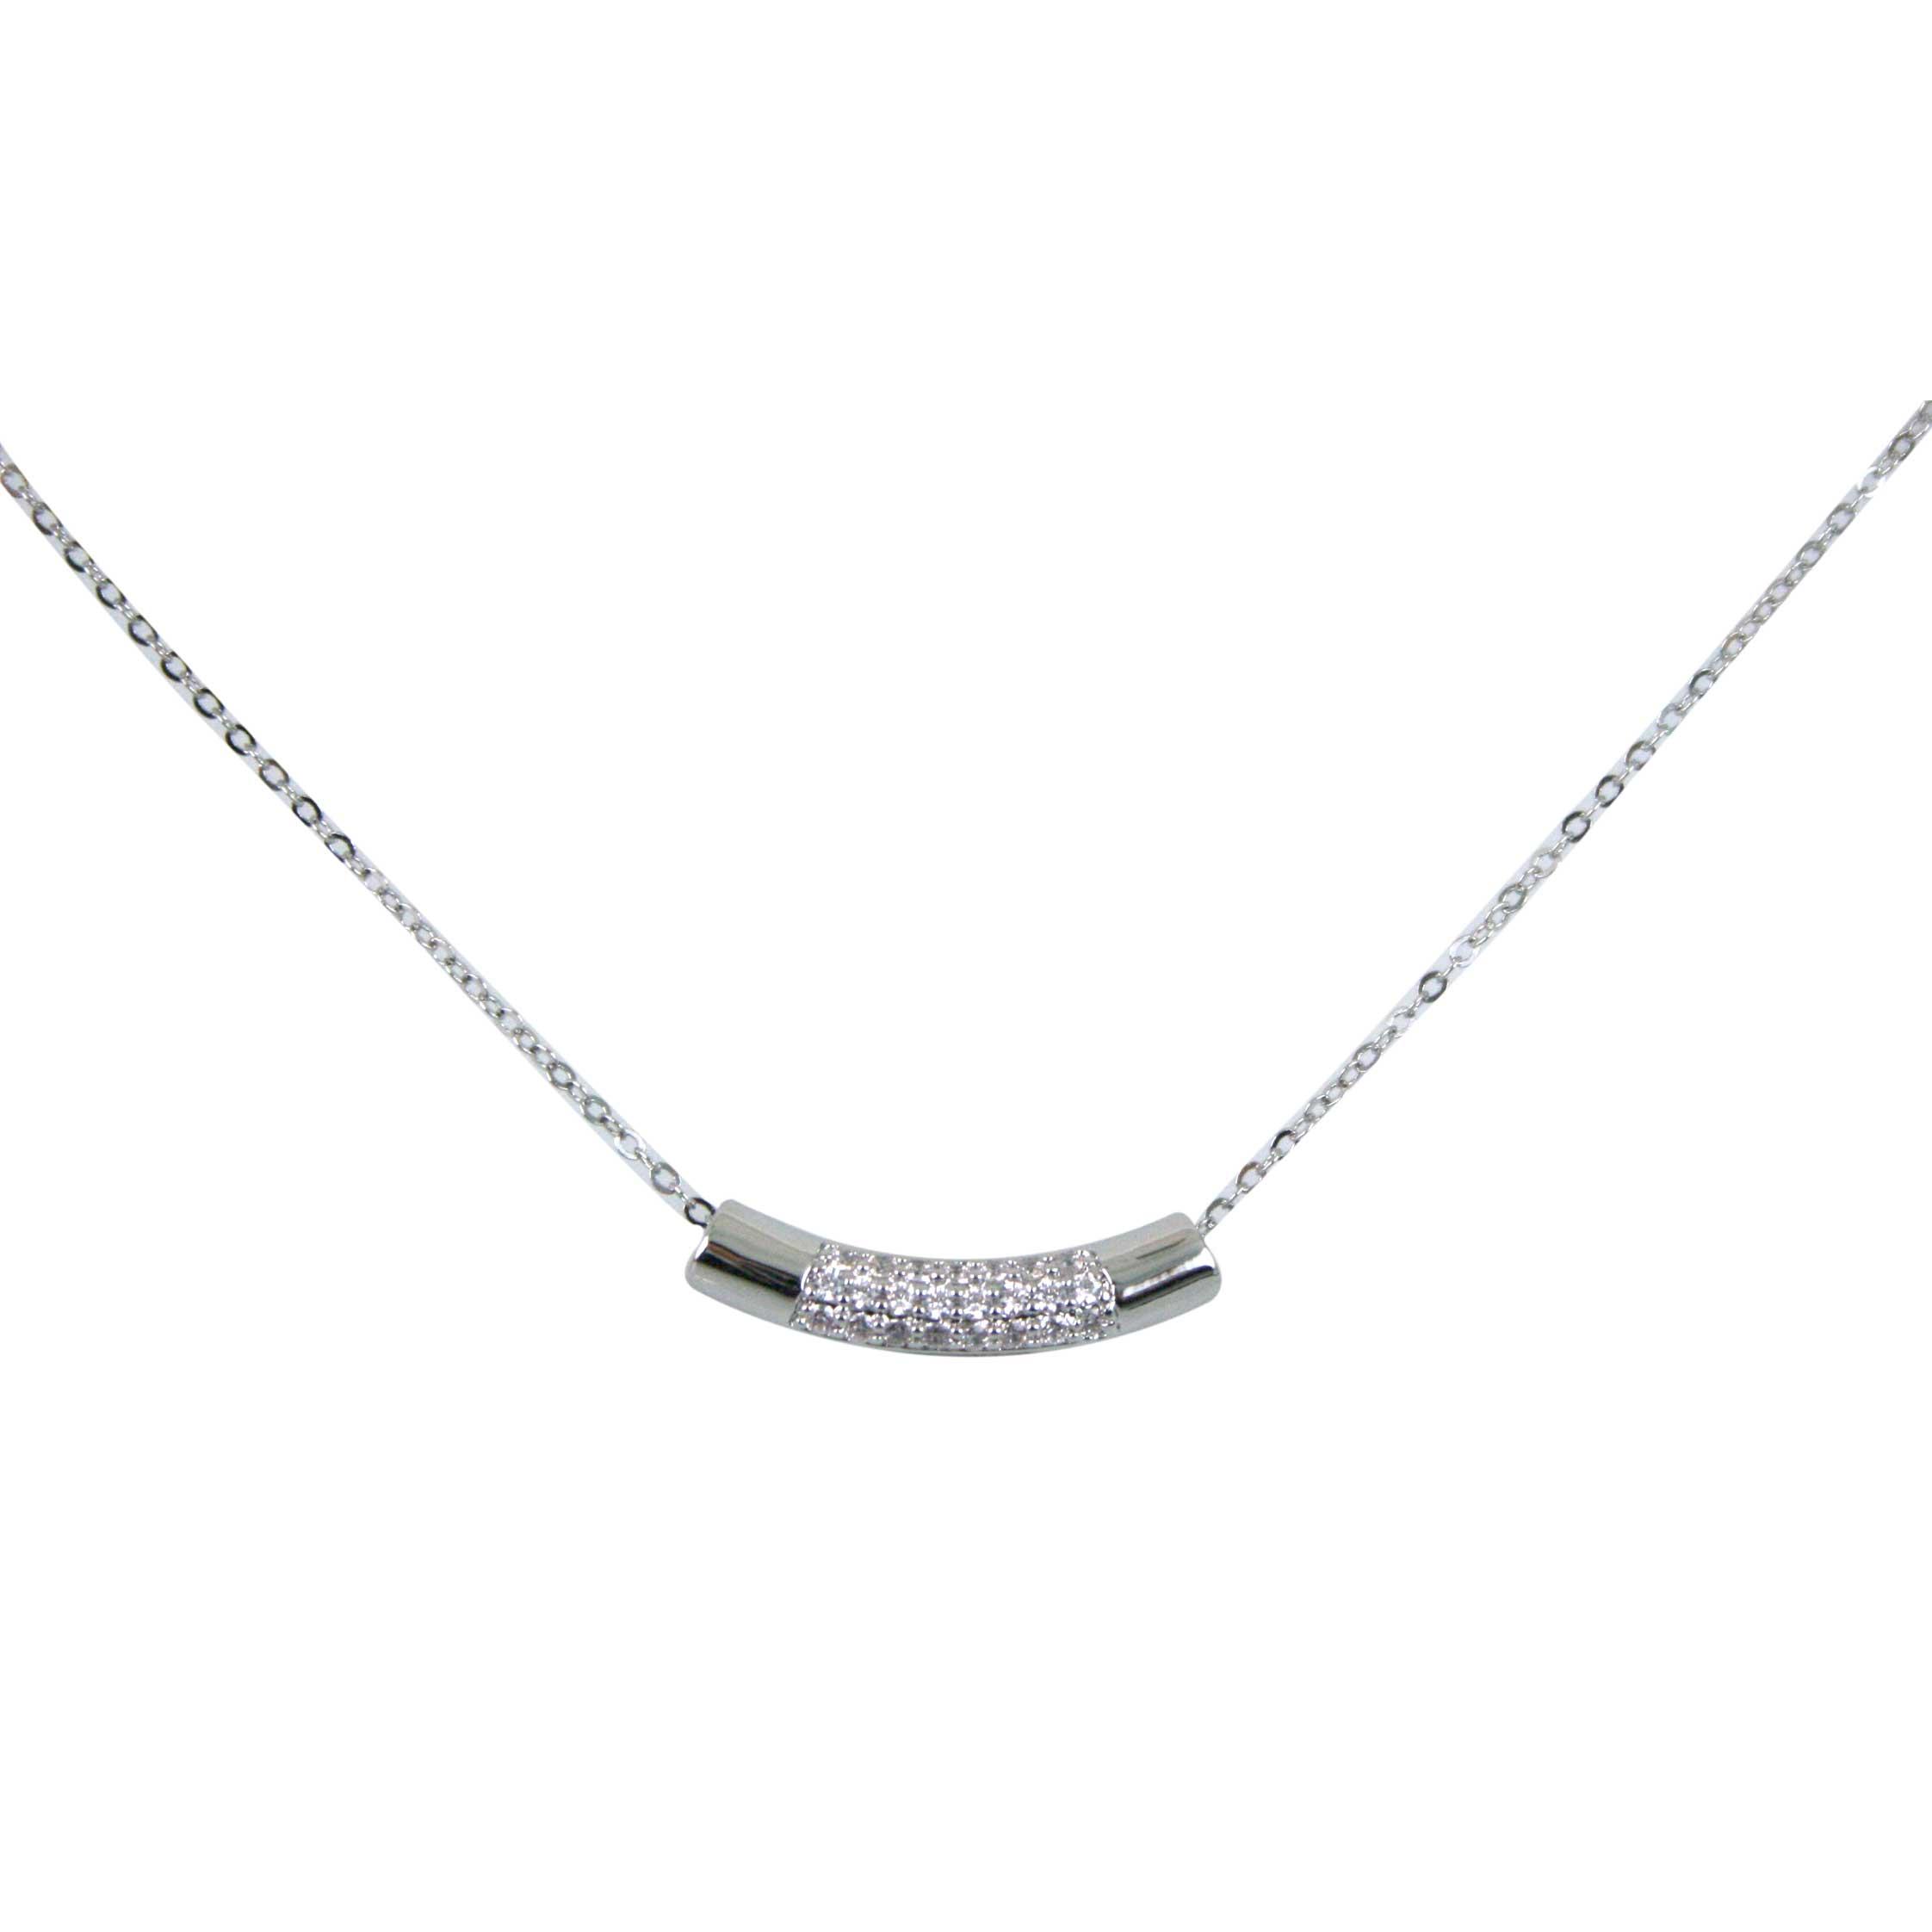 Diamante bar pendant